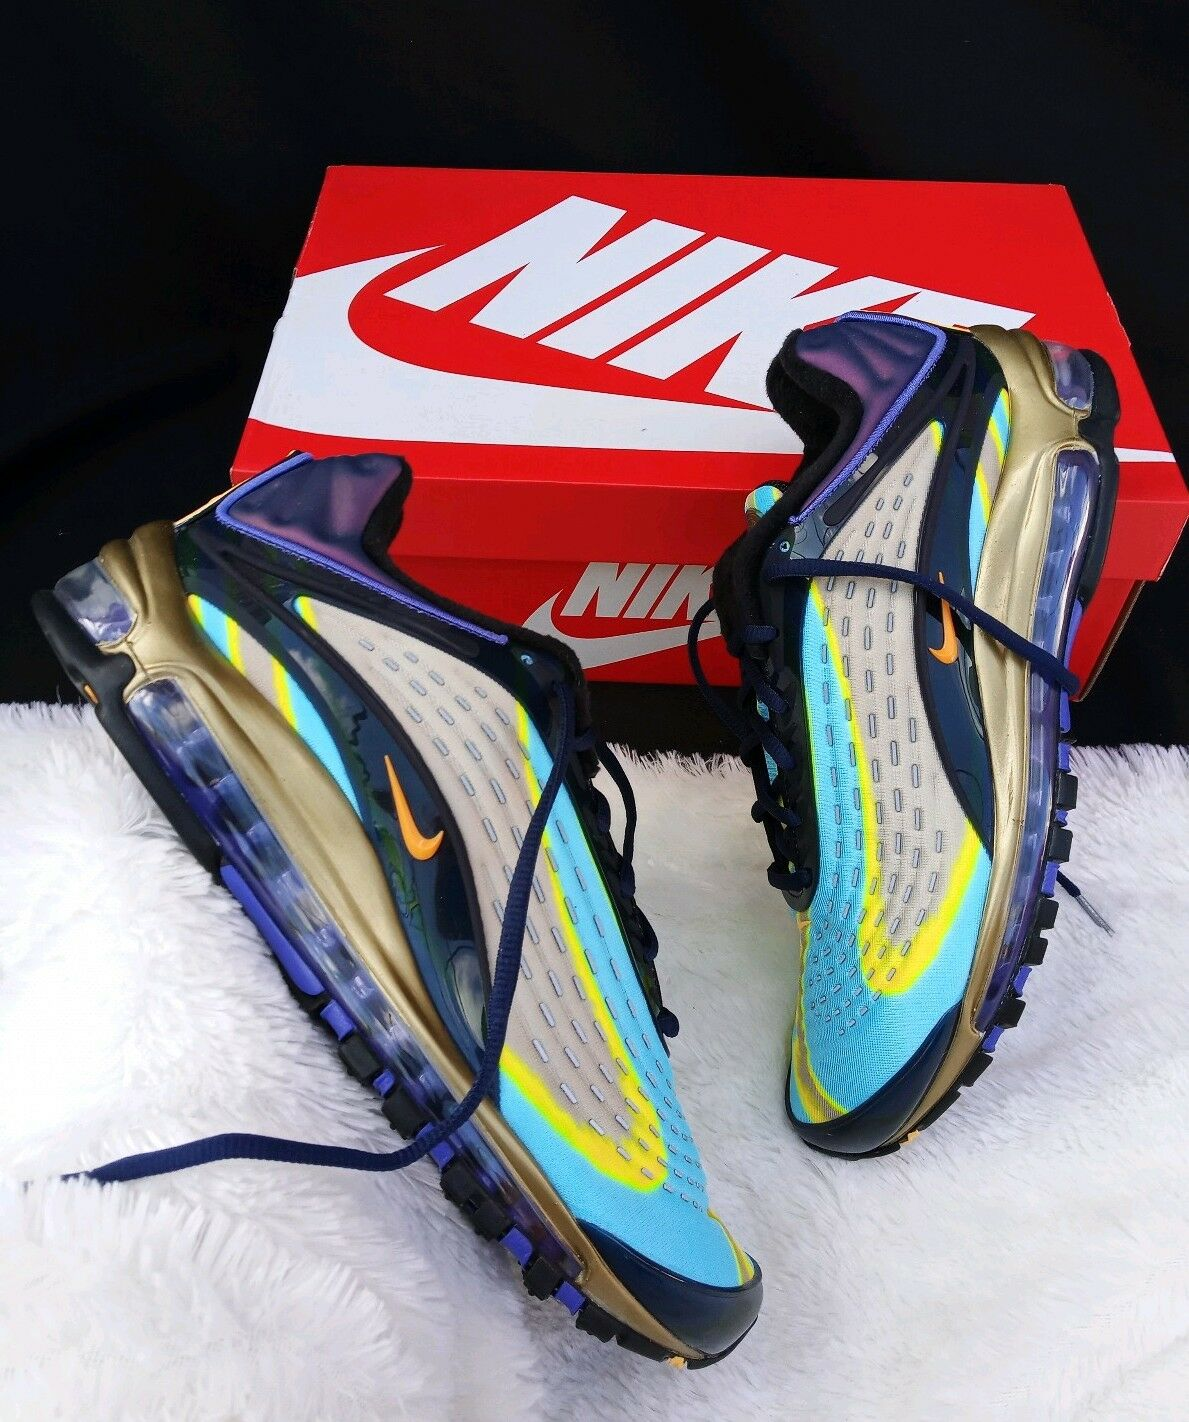 10 MEN'S Nike Air Max Deluxe OG 2018 Midnight Navy gold Multicolor AJ7831-400